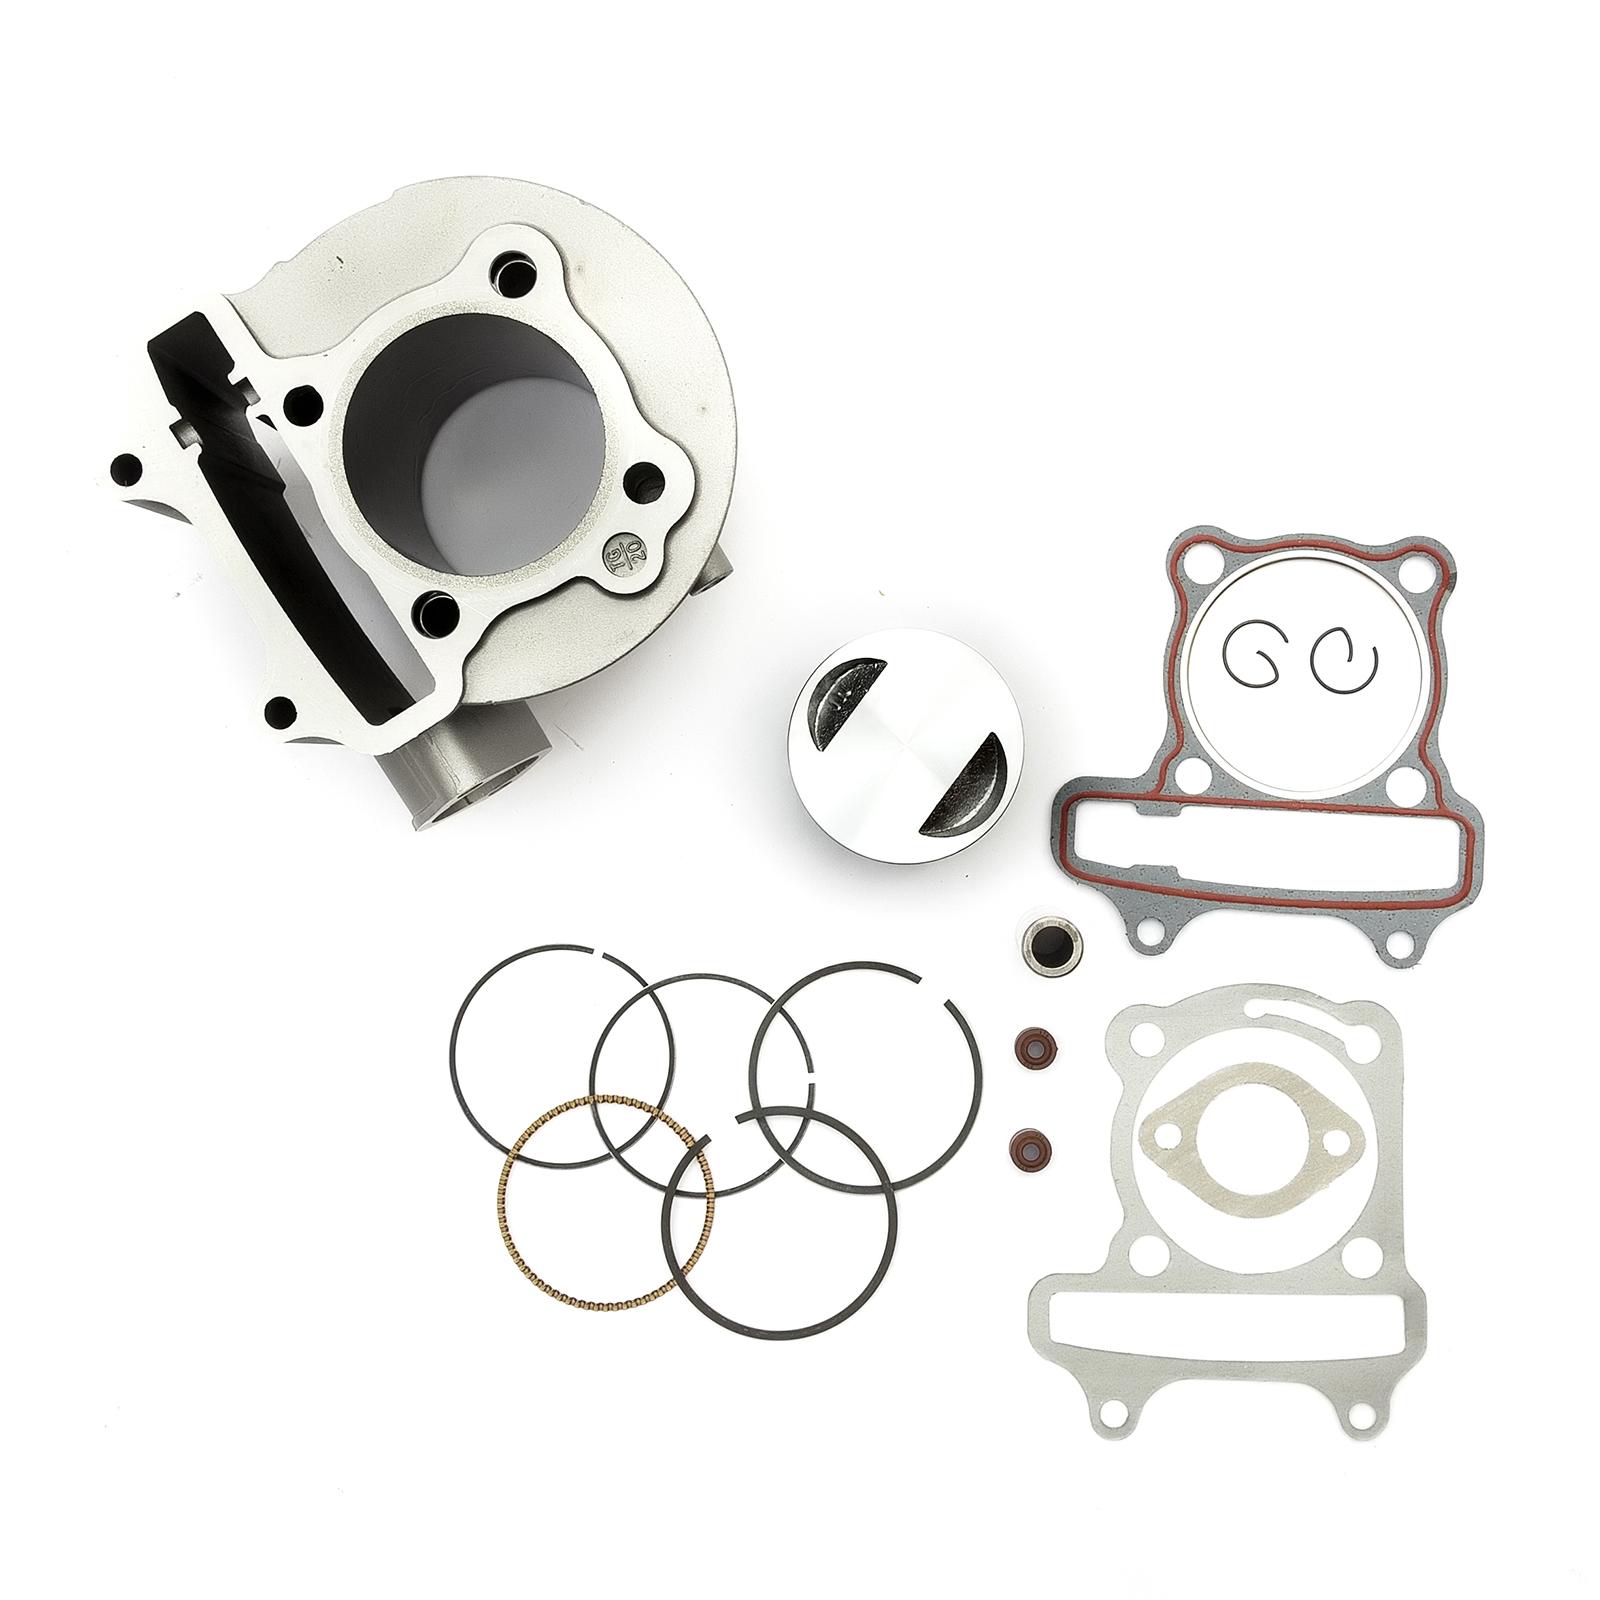 perfk Replacement Horizontal Engine Head Gasket Kit for 125cc SSR SDG Pit Pro Quad Dirt Bike ATV Buggy